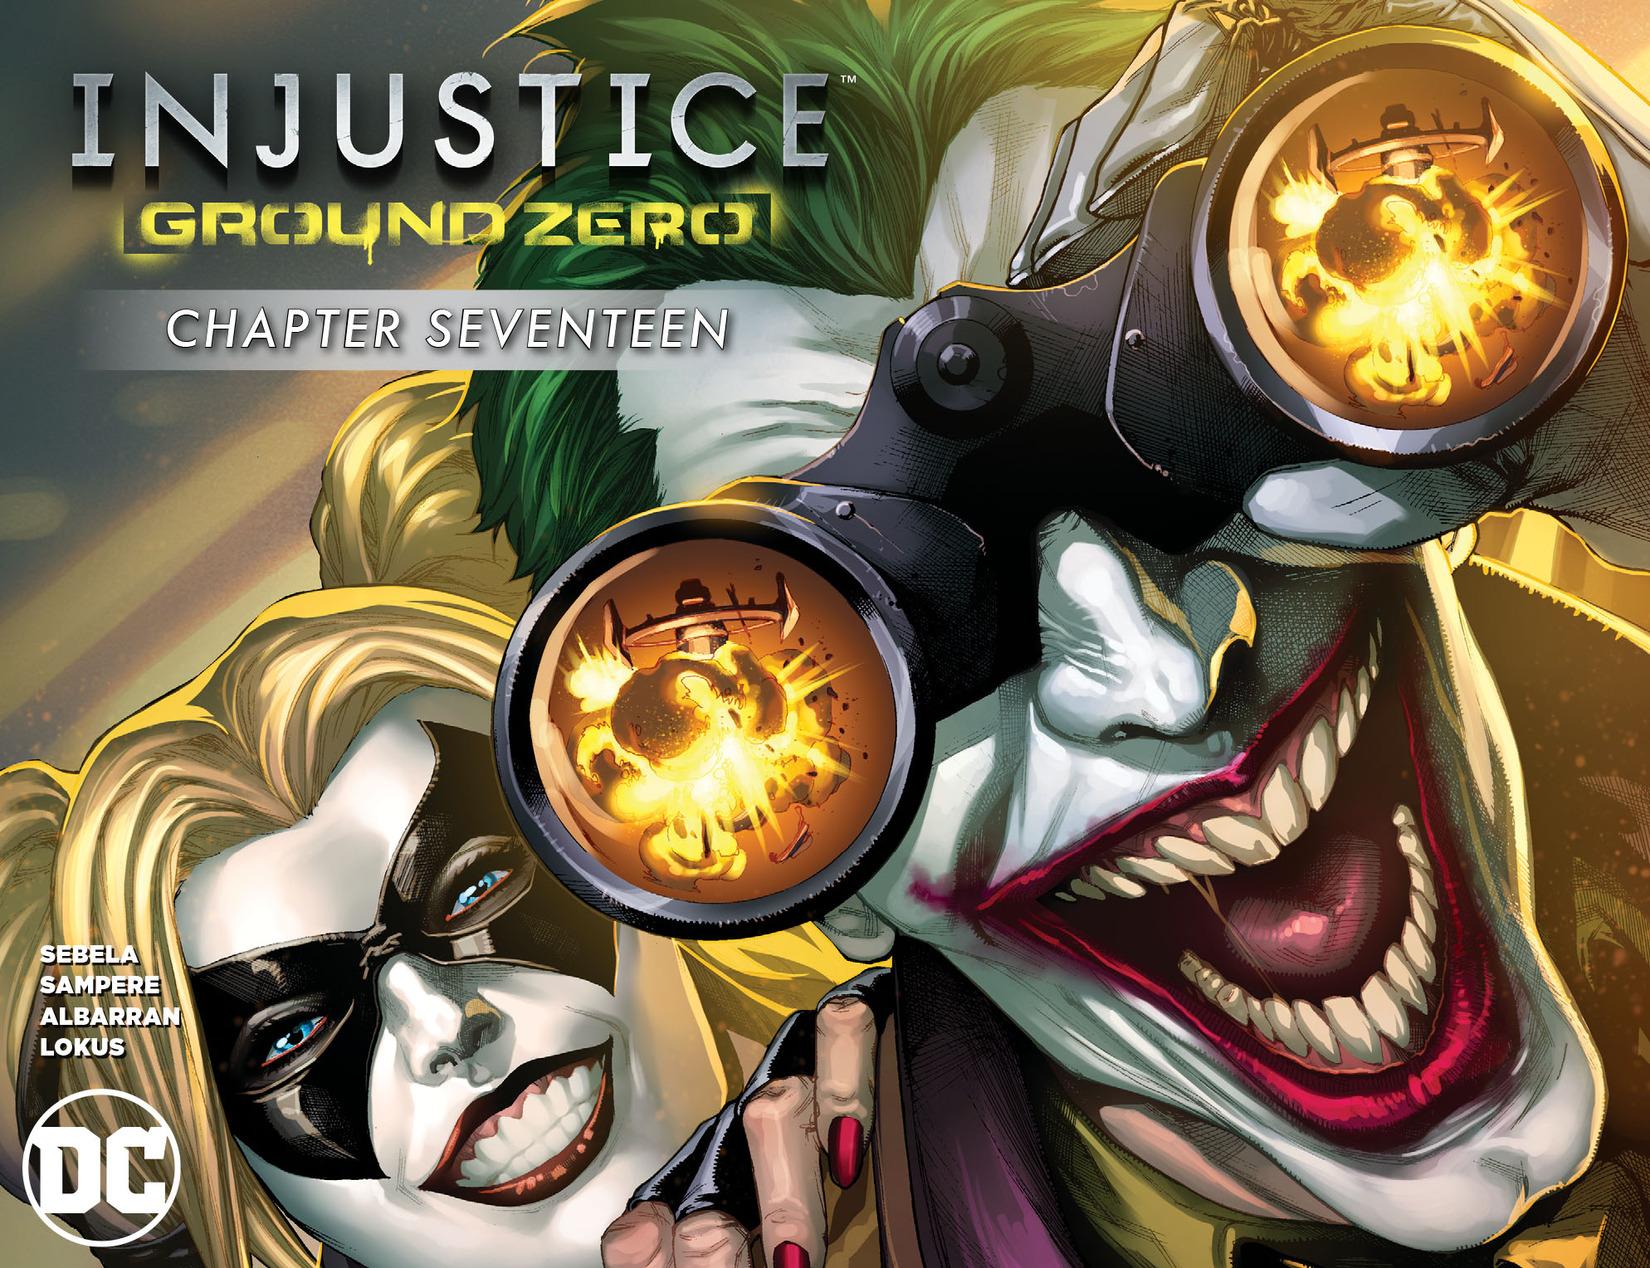 Read online Injustice: Ground Zero comic -  Issue #17 - 1